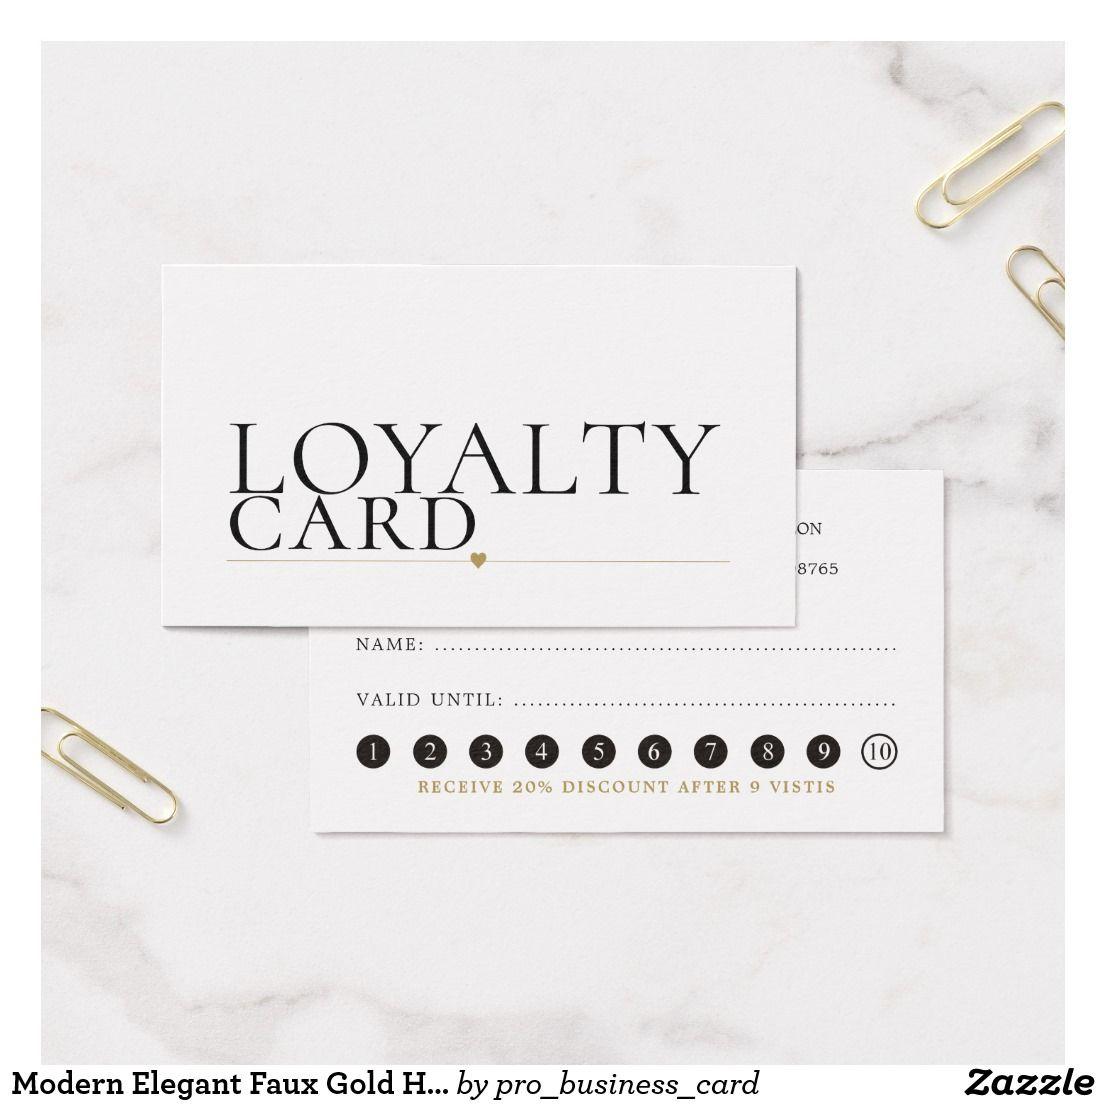 Modern Elegant Faux Gold Heart Line Beauty Loyalty Zazzle Com Loyalty Card Design Customizable Business Cards Templates Loyalty Card